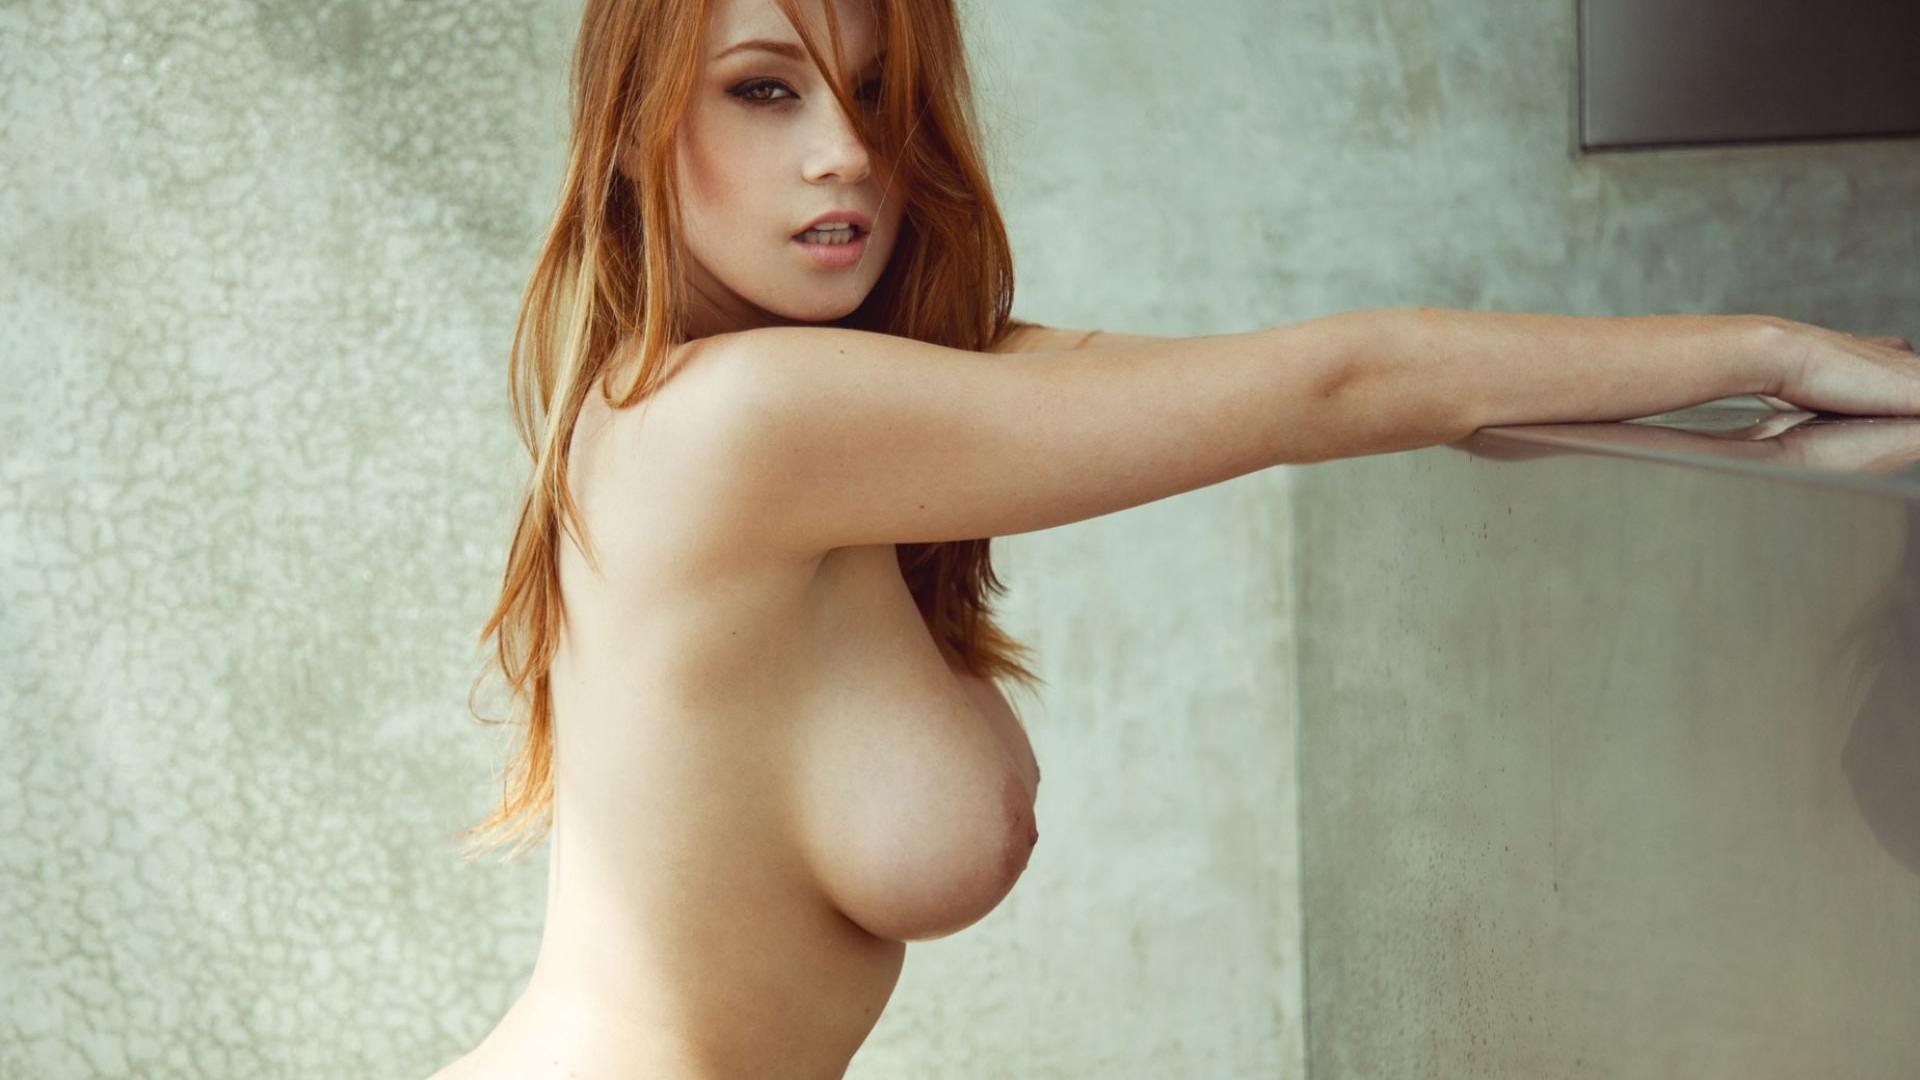 Liby women naked, womens inside vagina naked